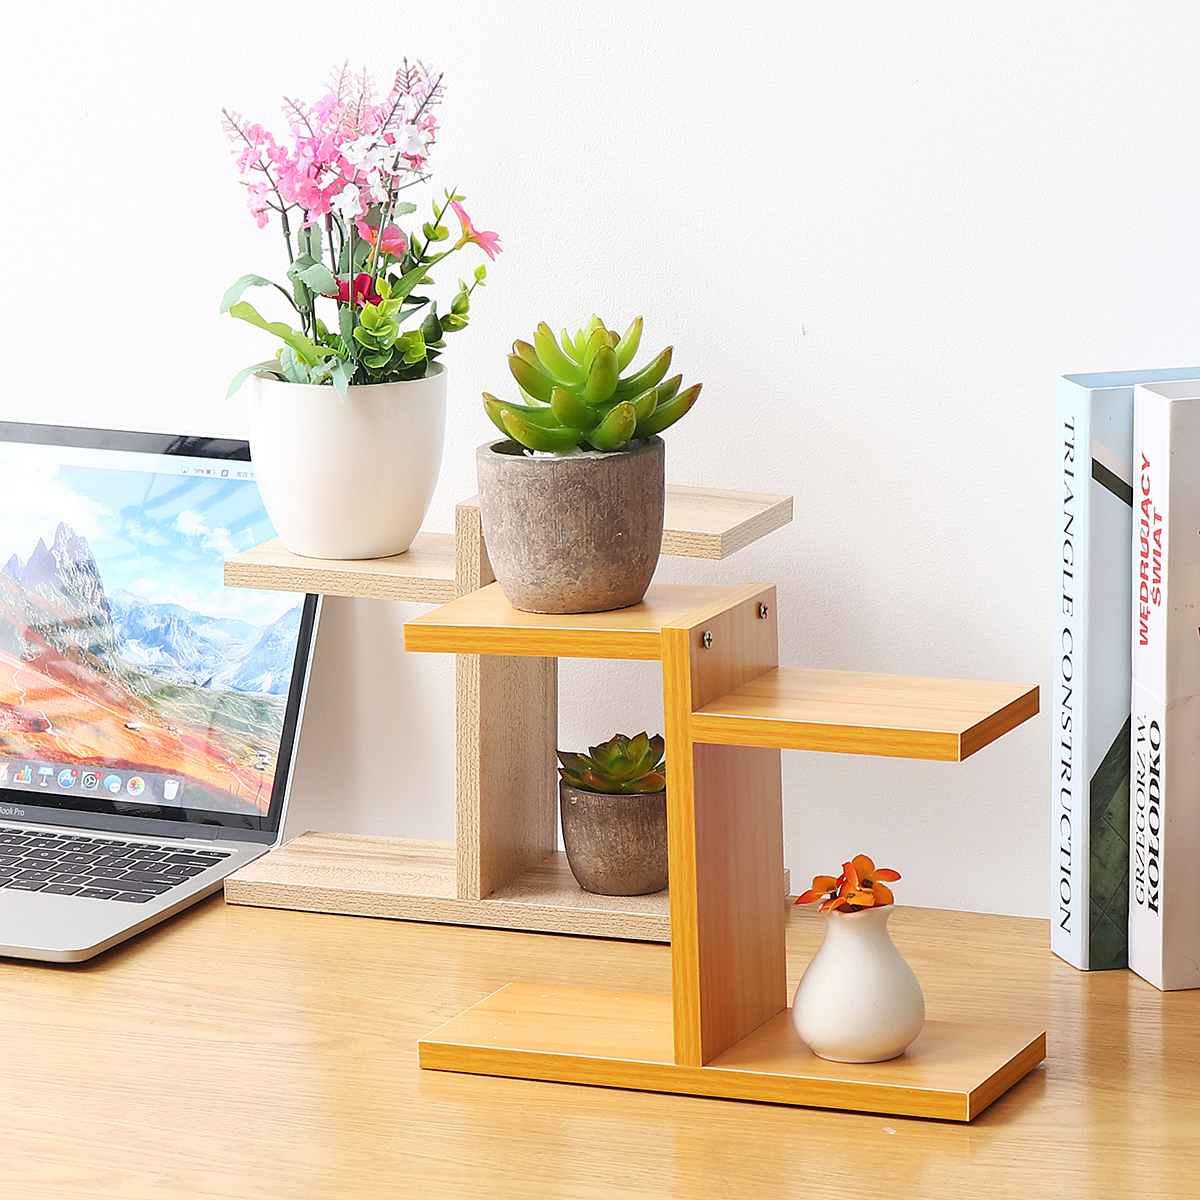 Retro Household MDF Multi-layer Plant Stand Succulent Shelf Rack Balcony Indoor Coffee Bar Desktop Garden Flower Pot Shelf